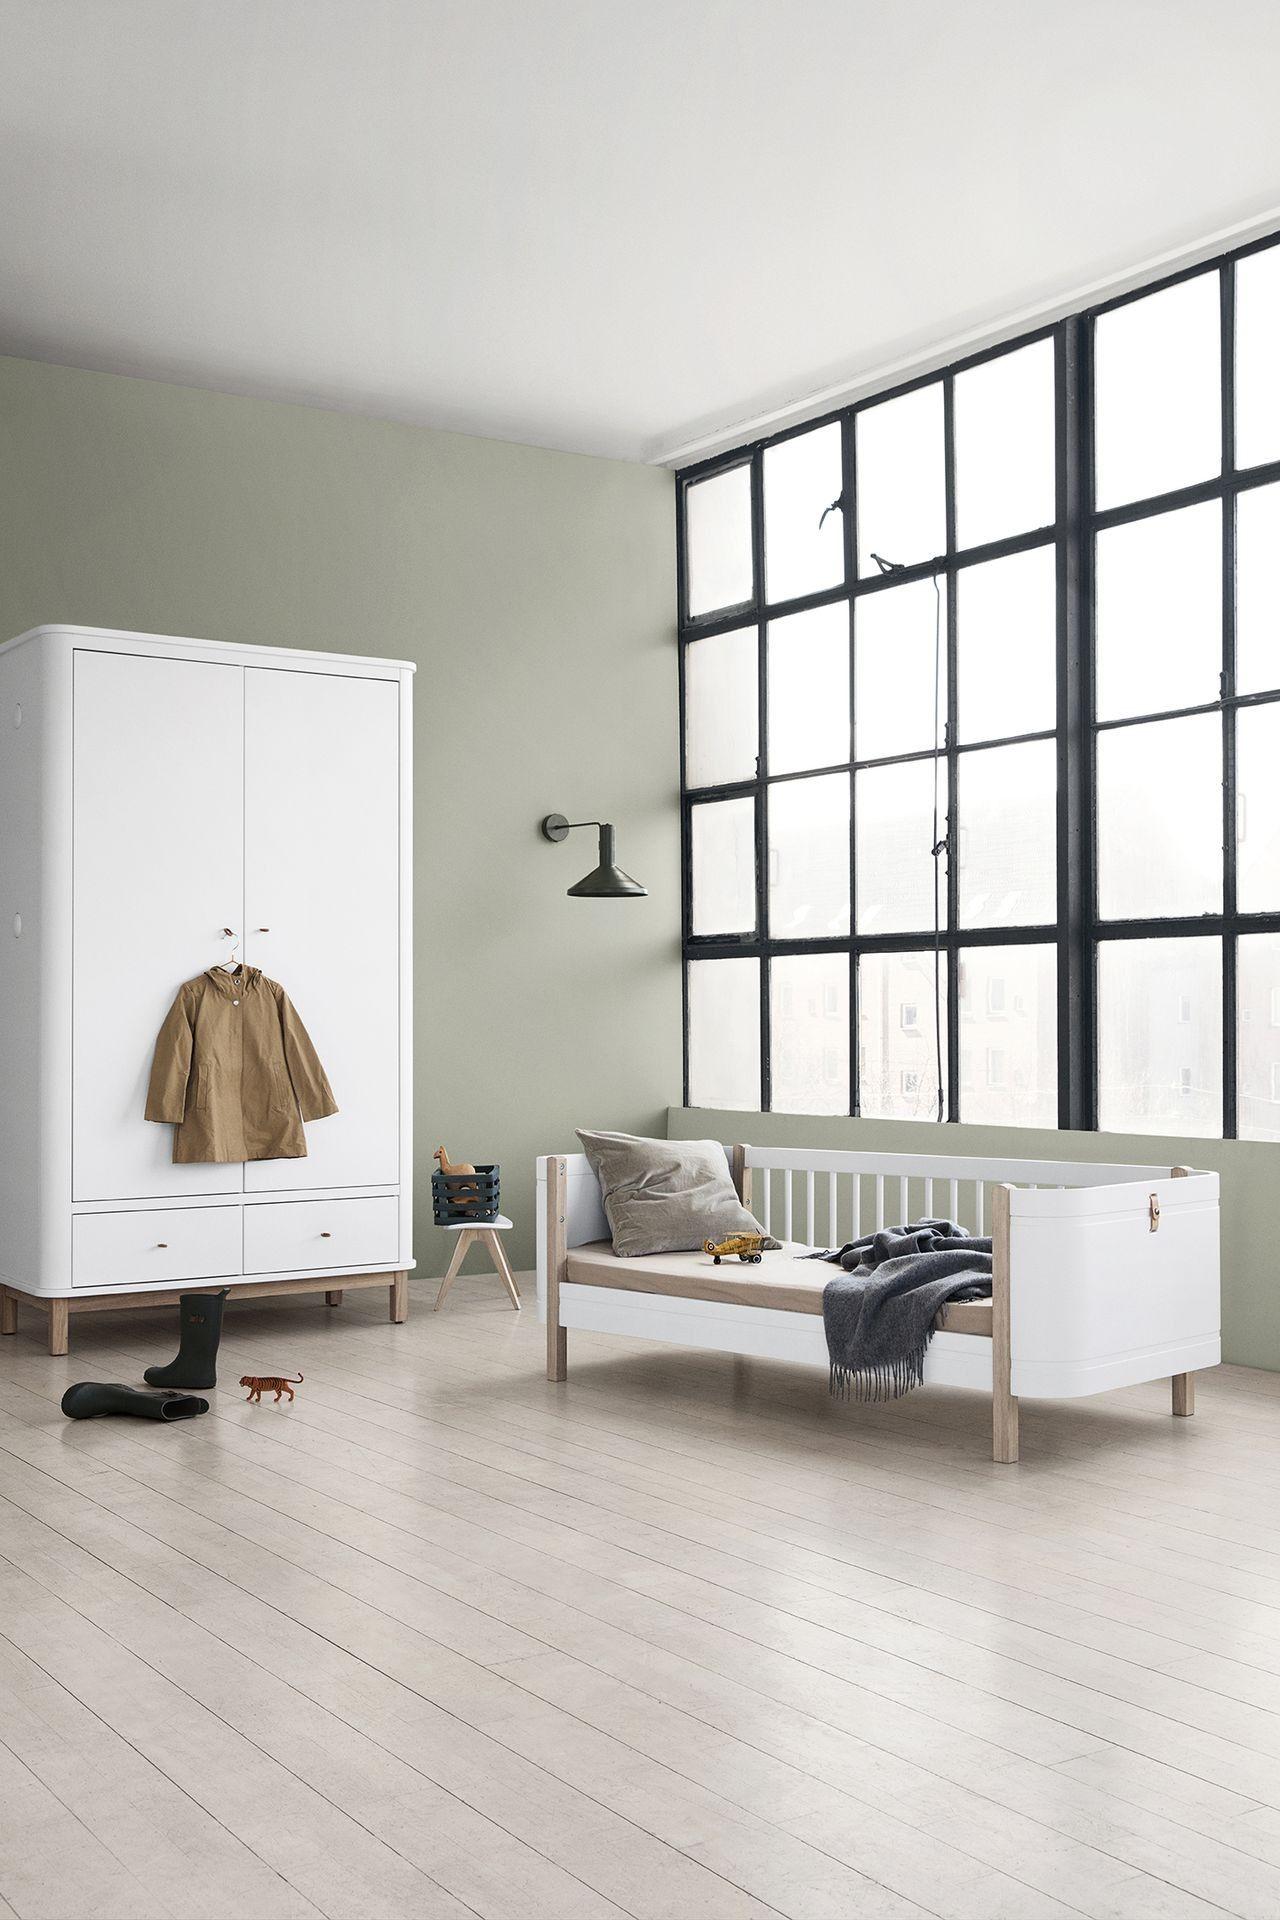 Umbauset Oliver Furniture Wood Mini+ Halbhohes Hochbett Zum Mini+  Juniorbett   Kleine Fabriek